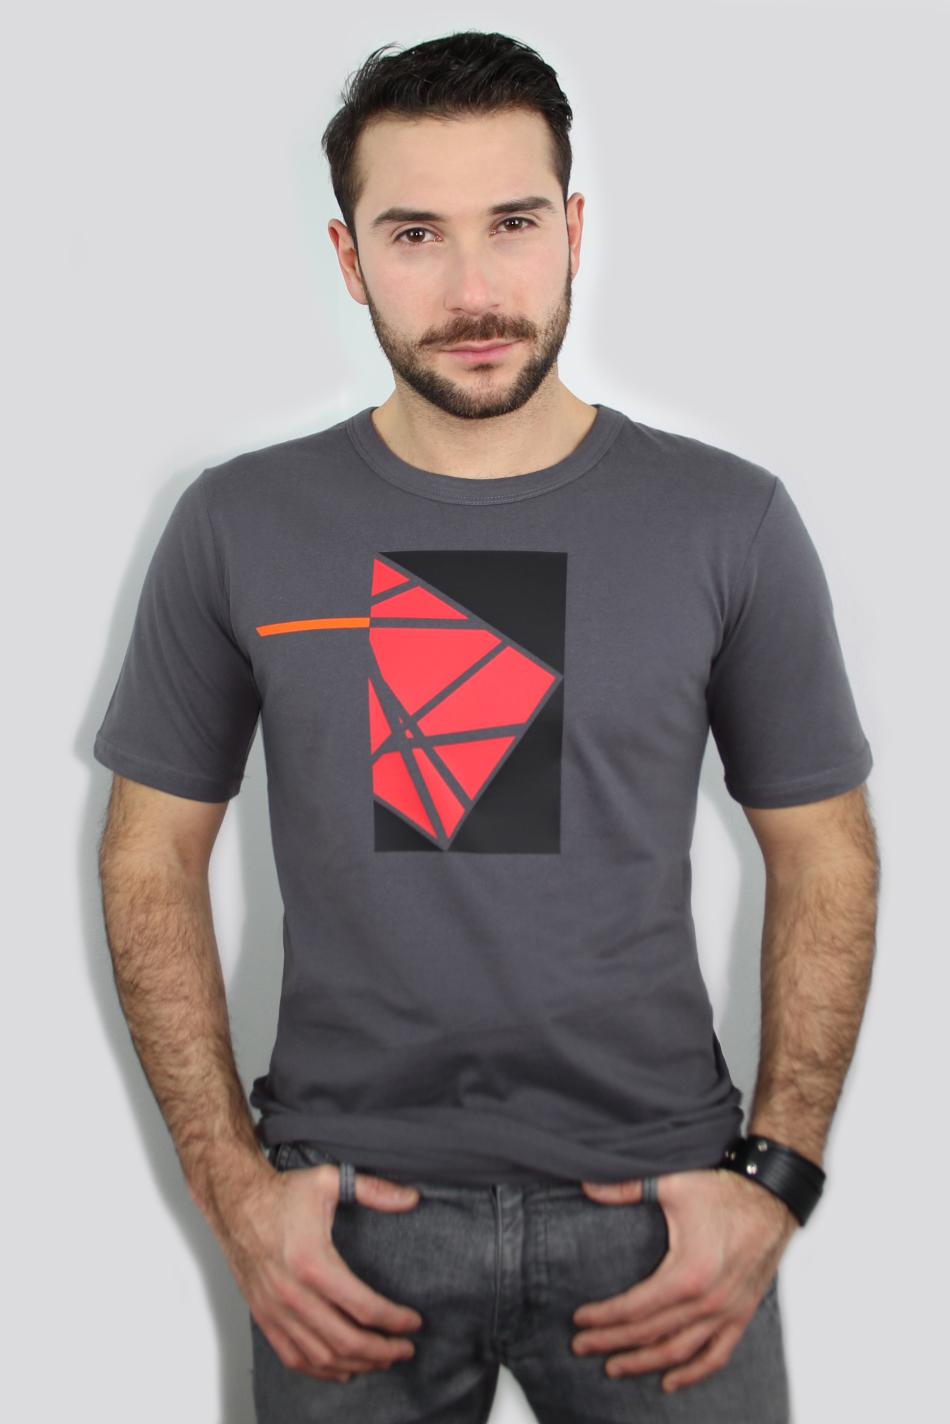 t-shirt design gianluca Sgalippa znak collection